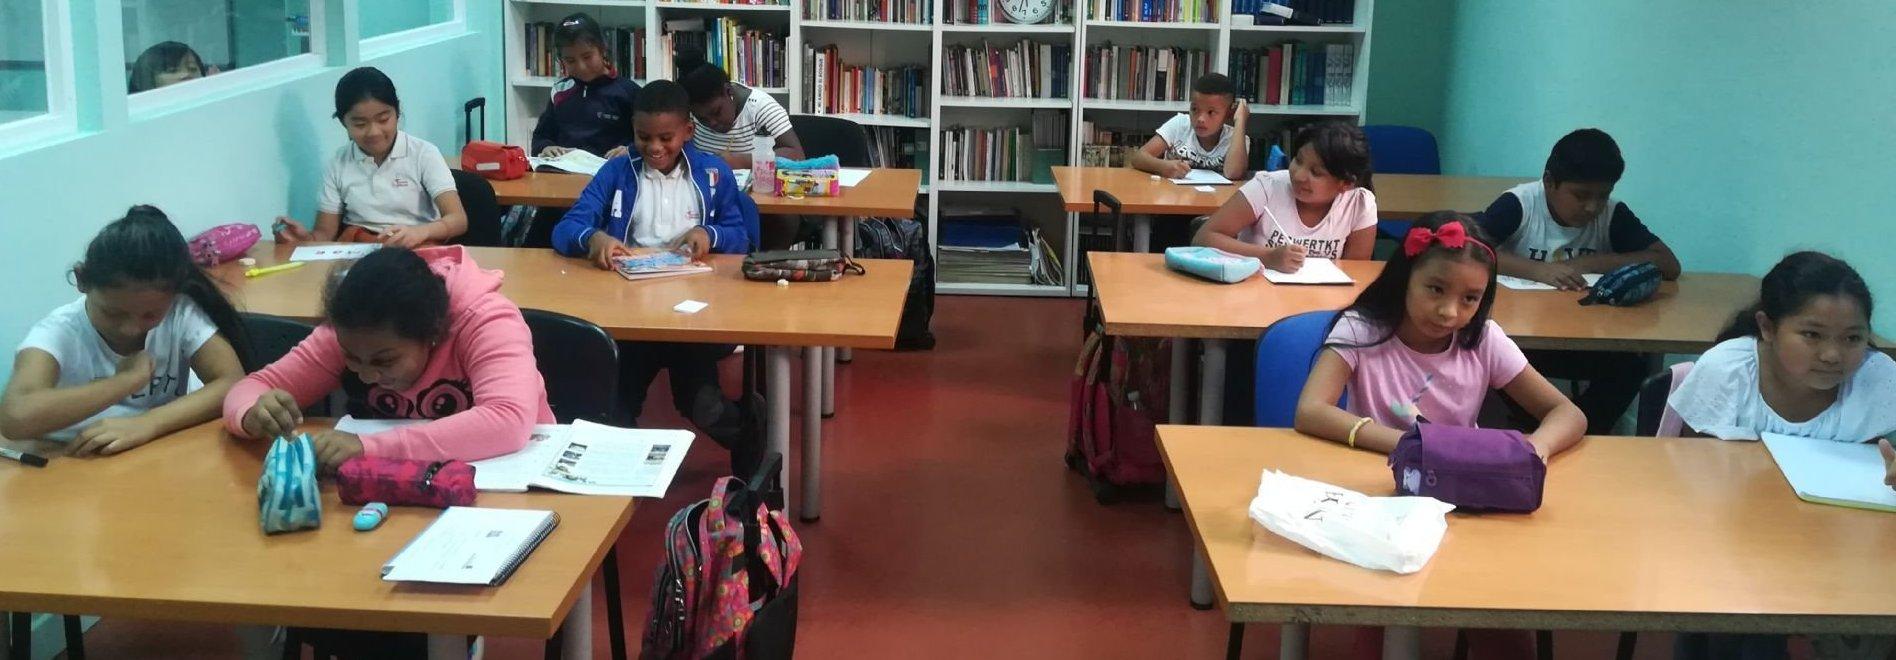 La Aventura de Educar en el CEPI de Tetuán